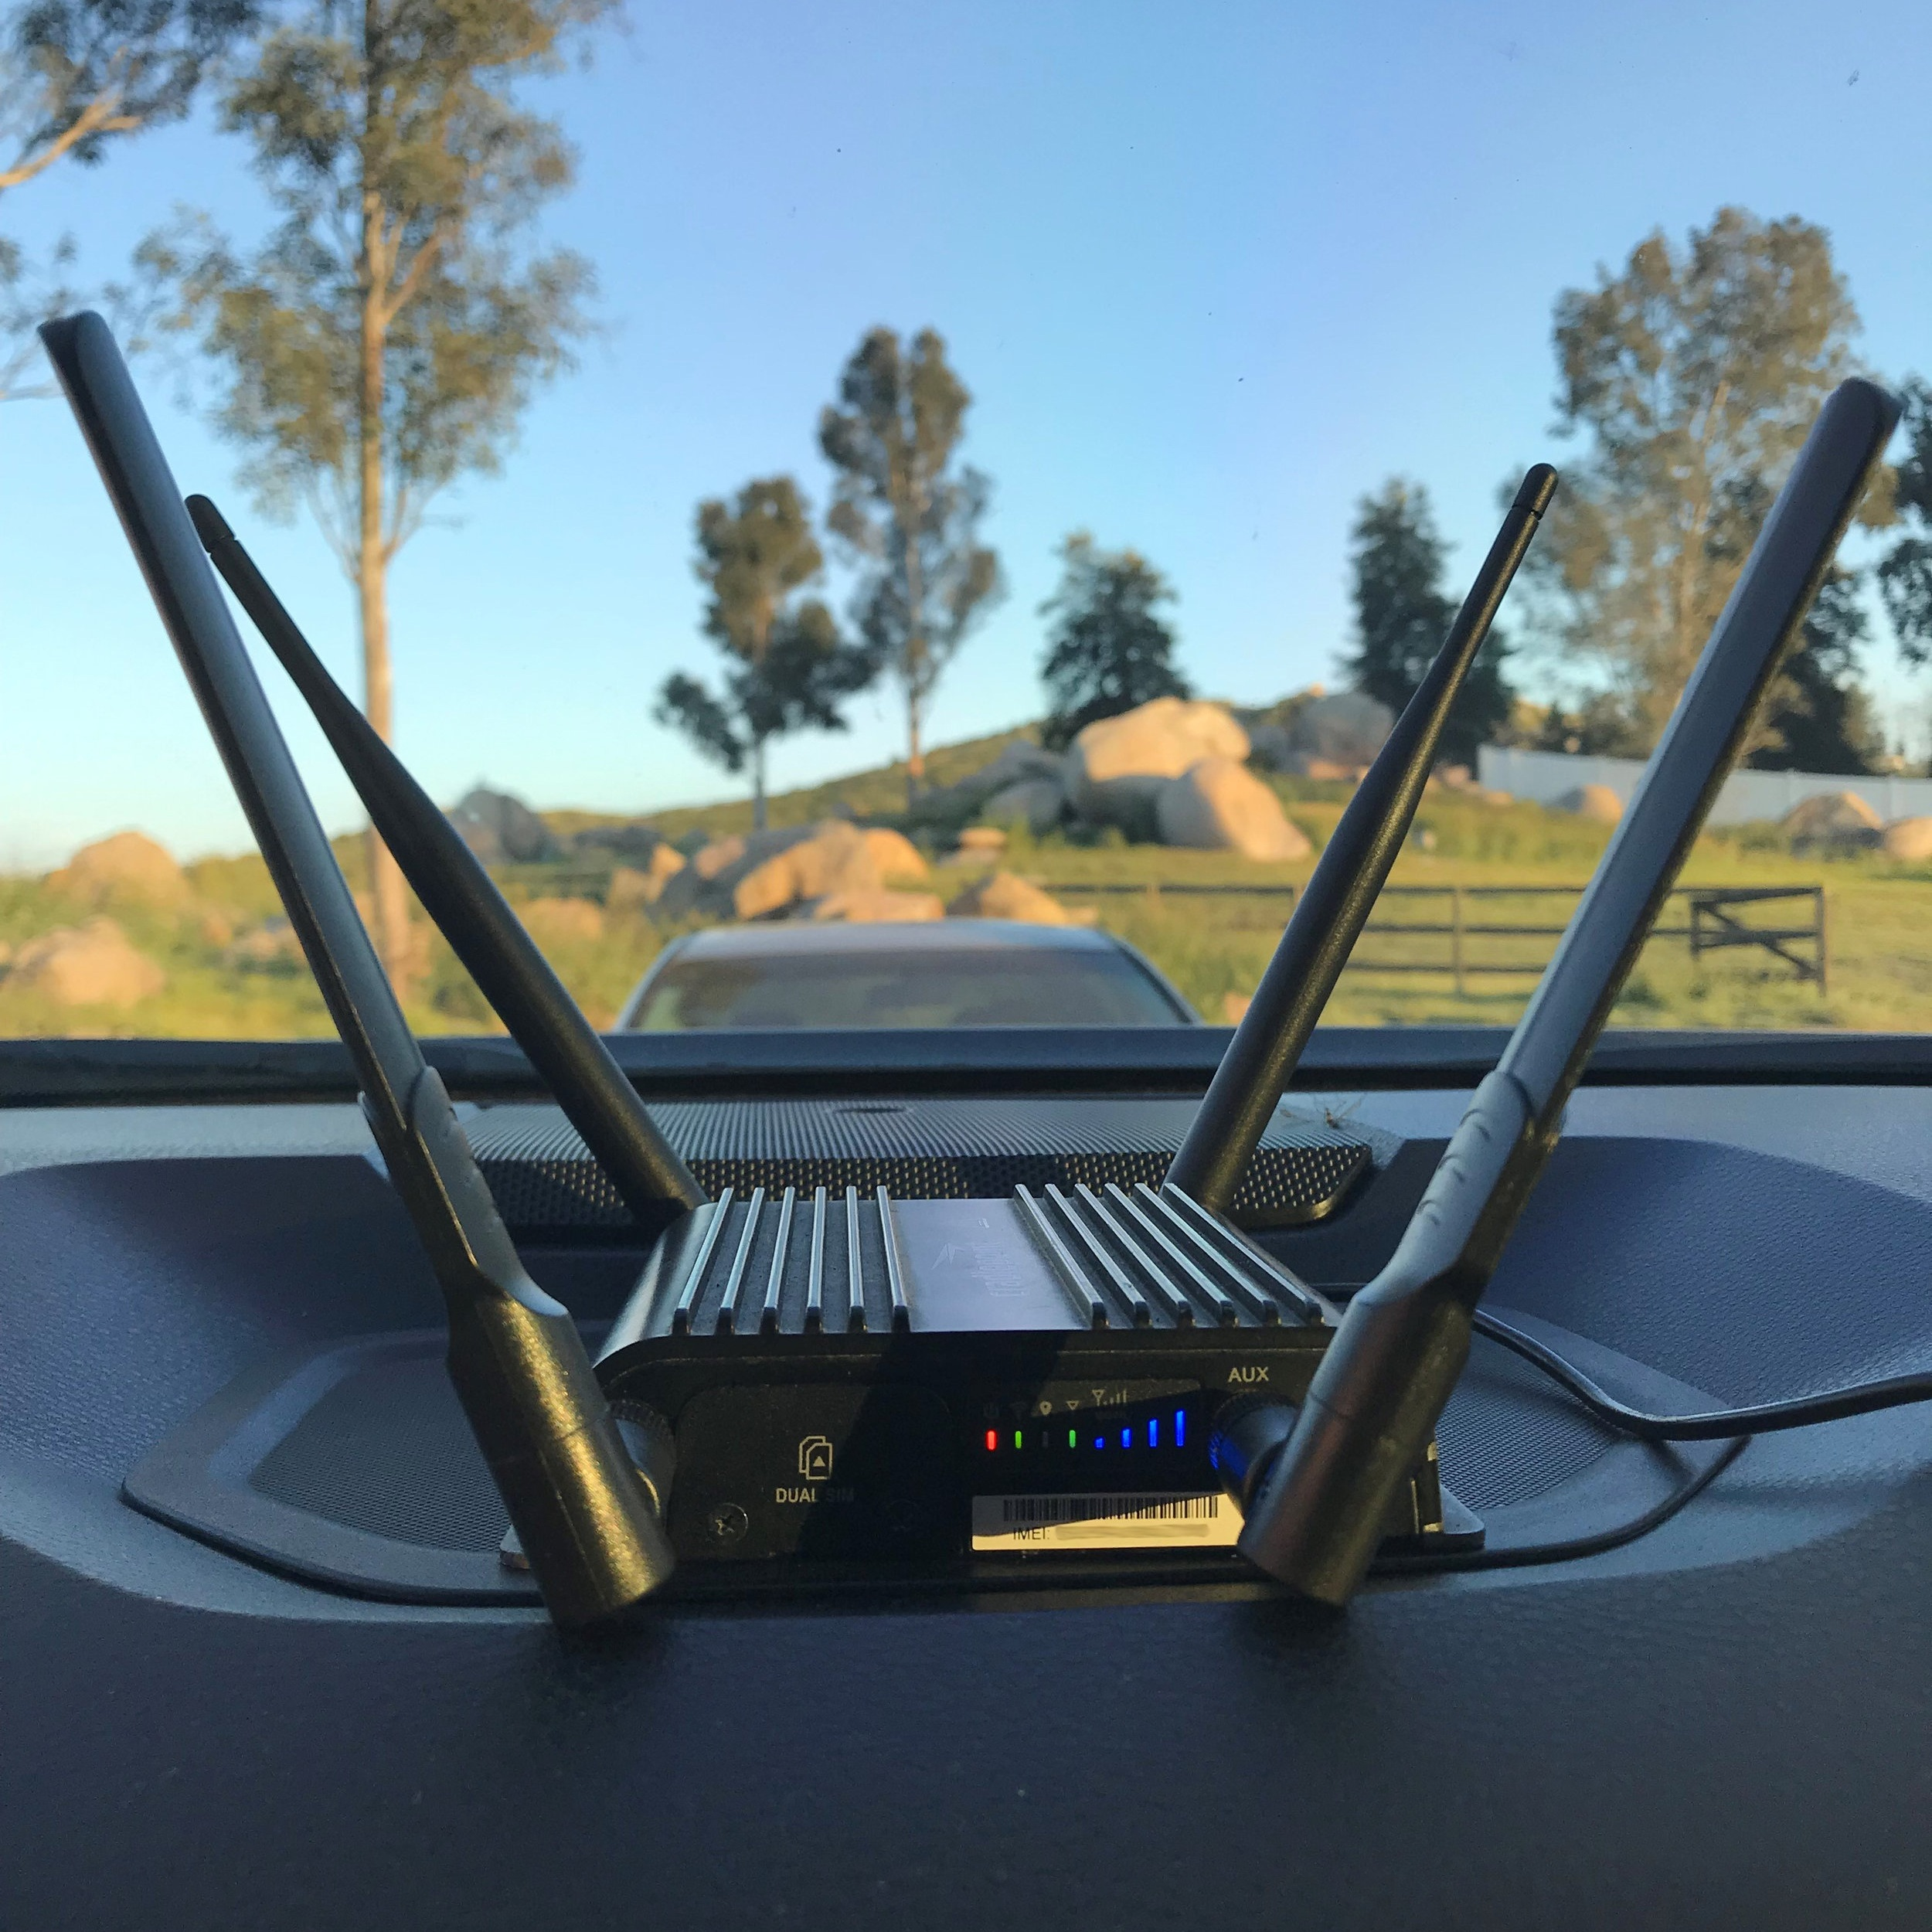 cell modem 900 vehicle setup with stick antennas.jpg